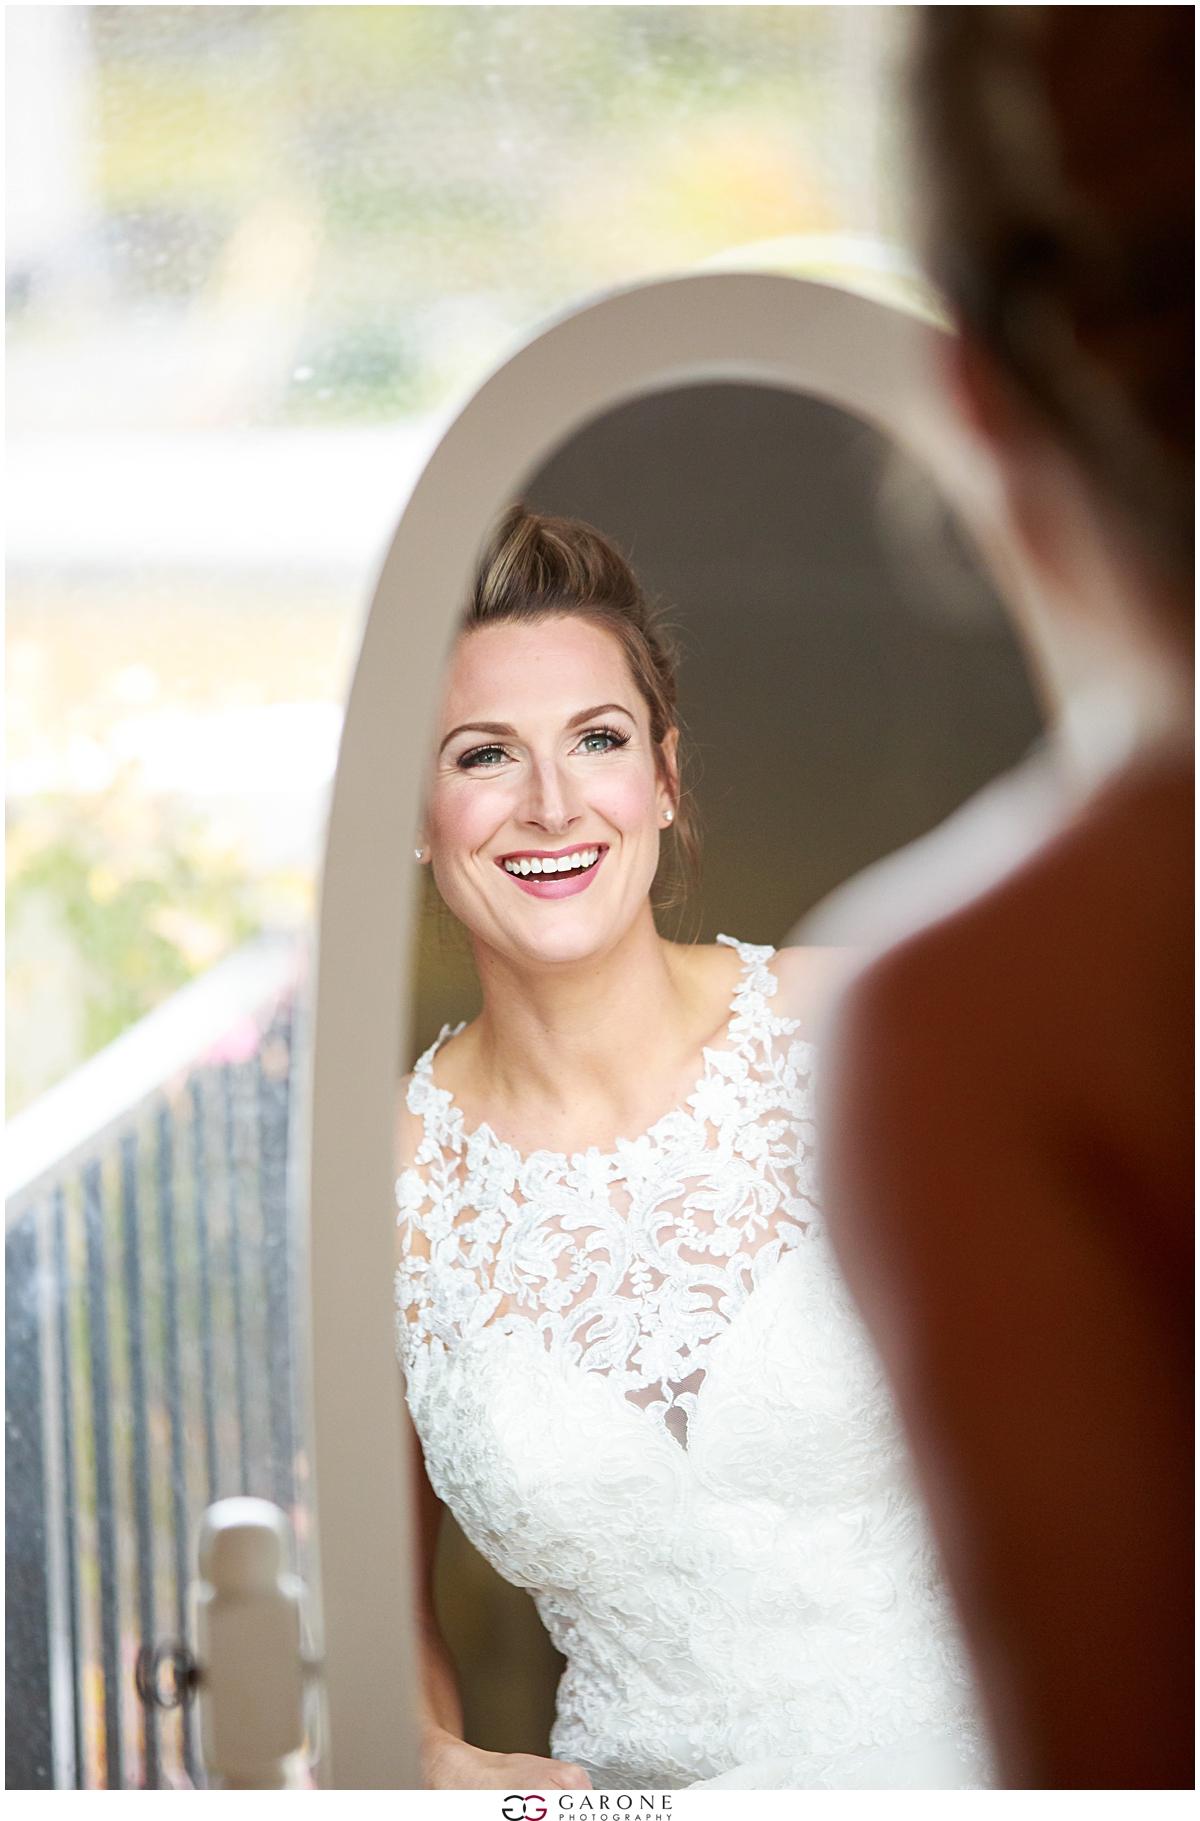 Kate_Chris_Atlantica_Cohasset_Massachusettes_Boston_Wedding_Photography_Garone_Photography_0041.jpg